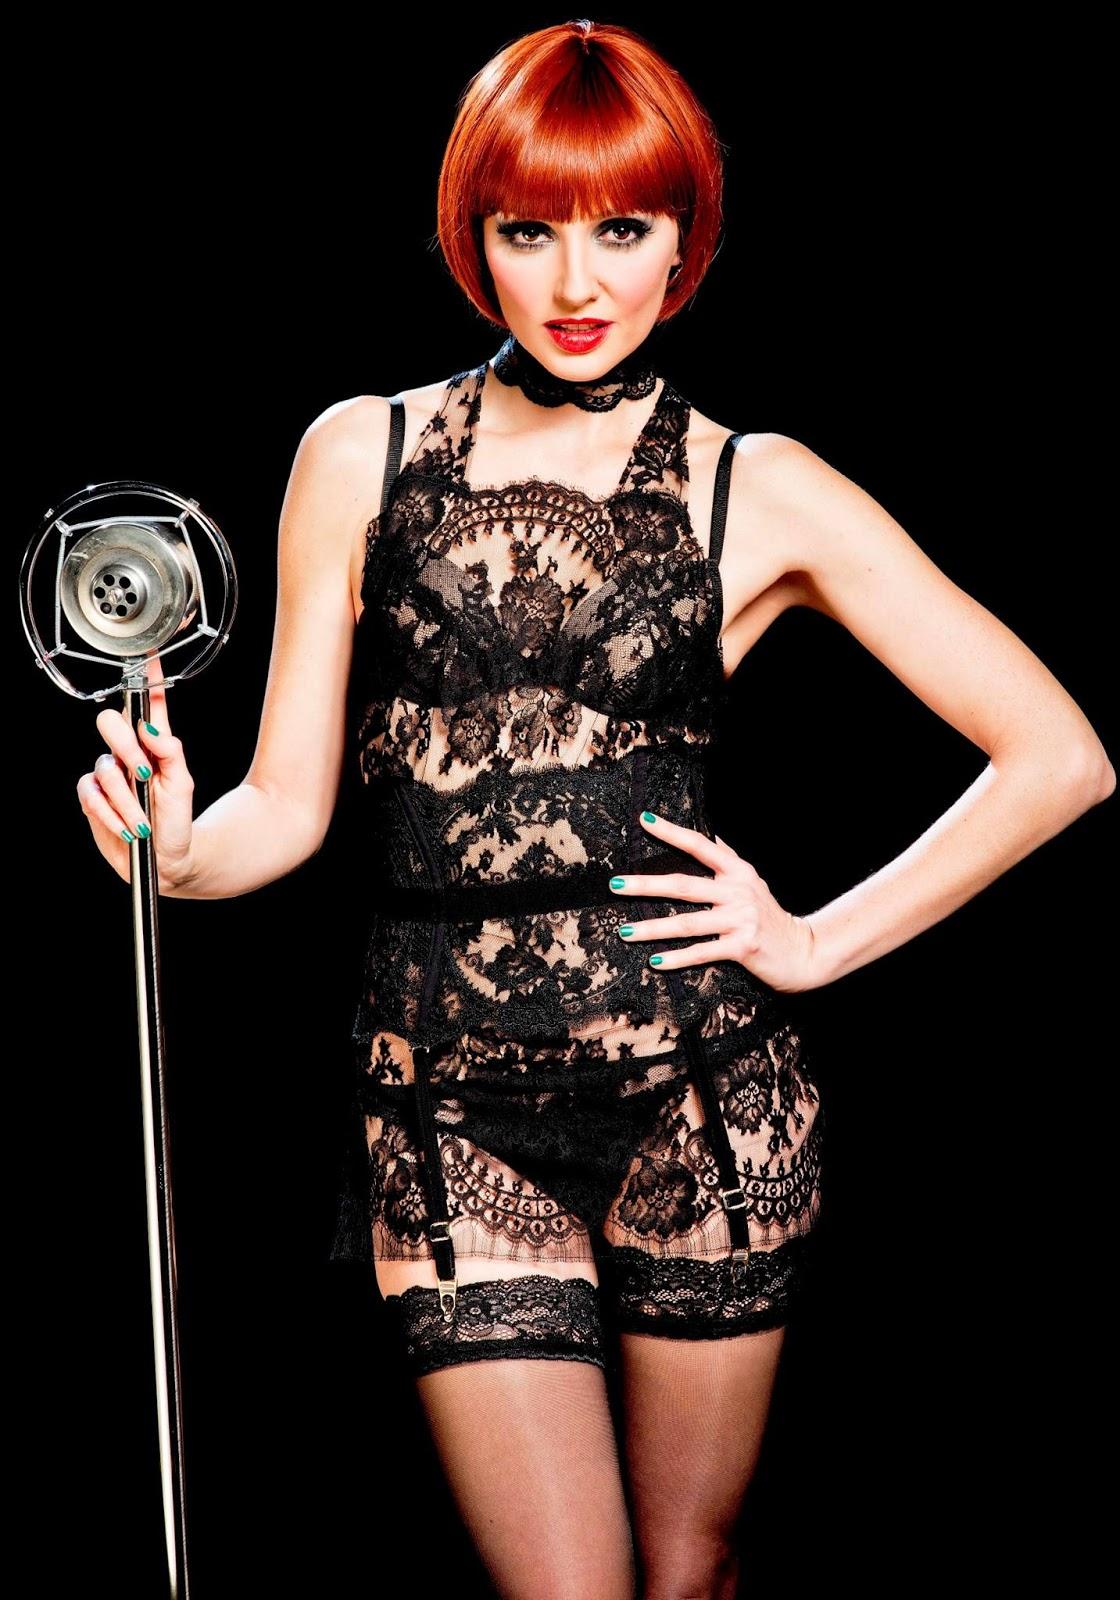 Cristina casta o protagonizar las 24 funciones de cabaret en el cuy s - Gran canaria tv com ...